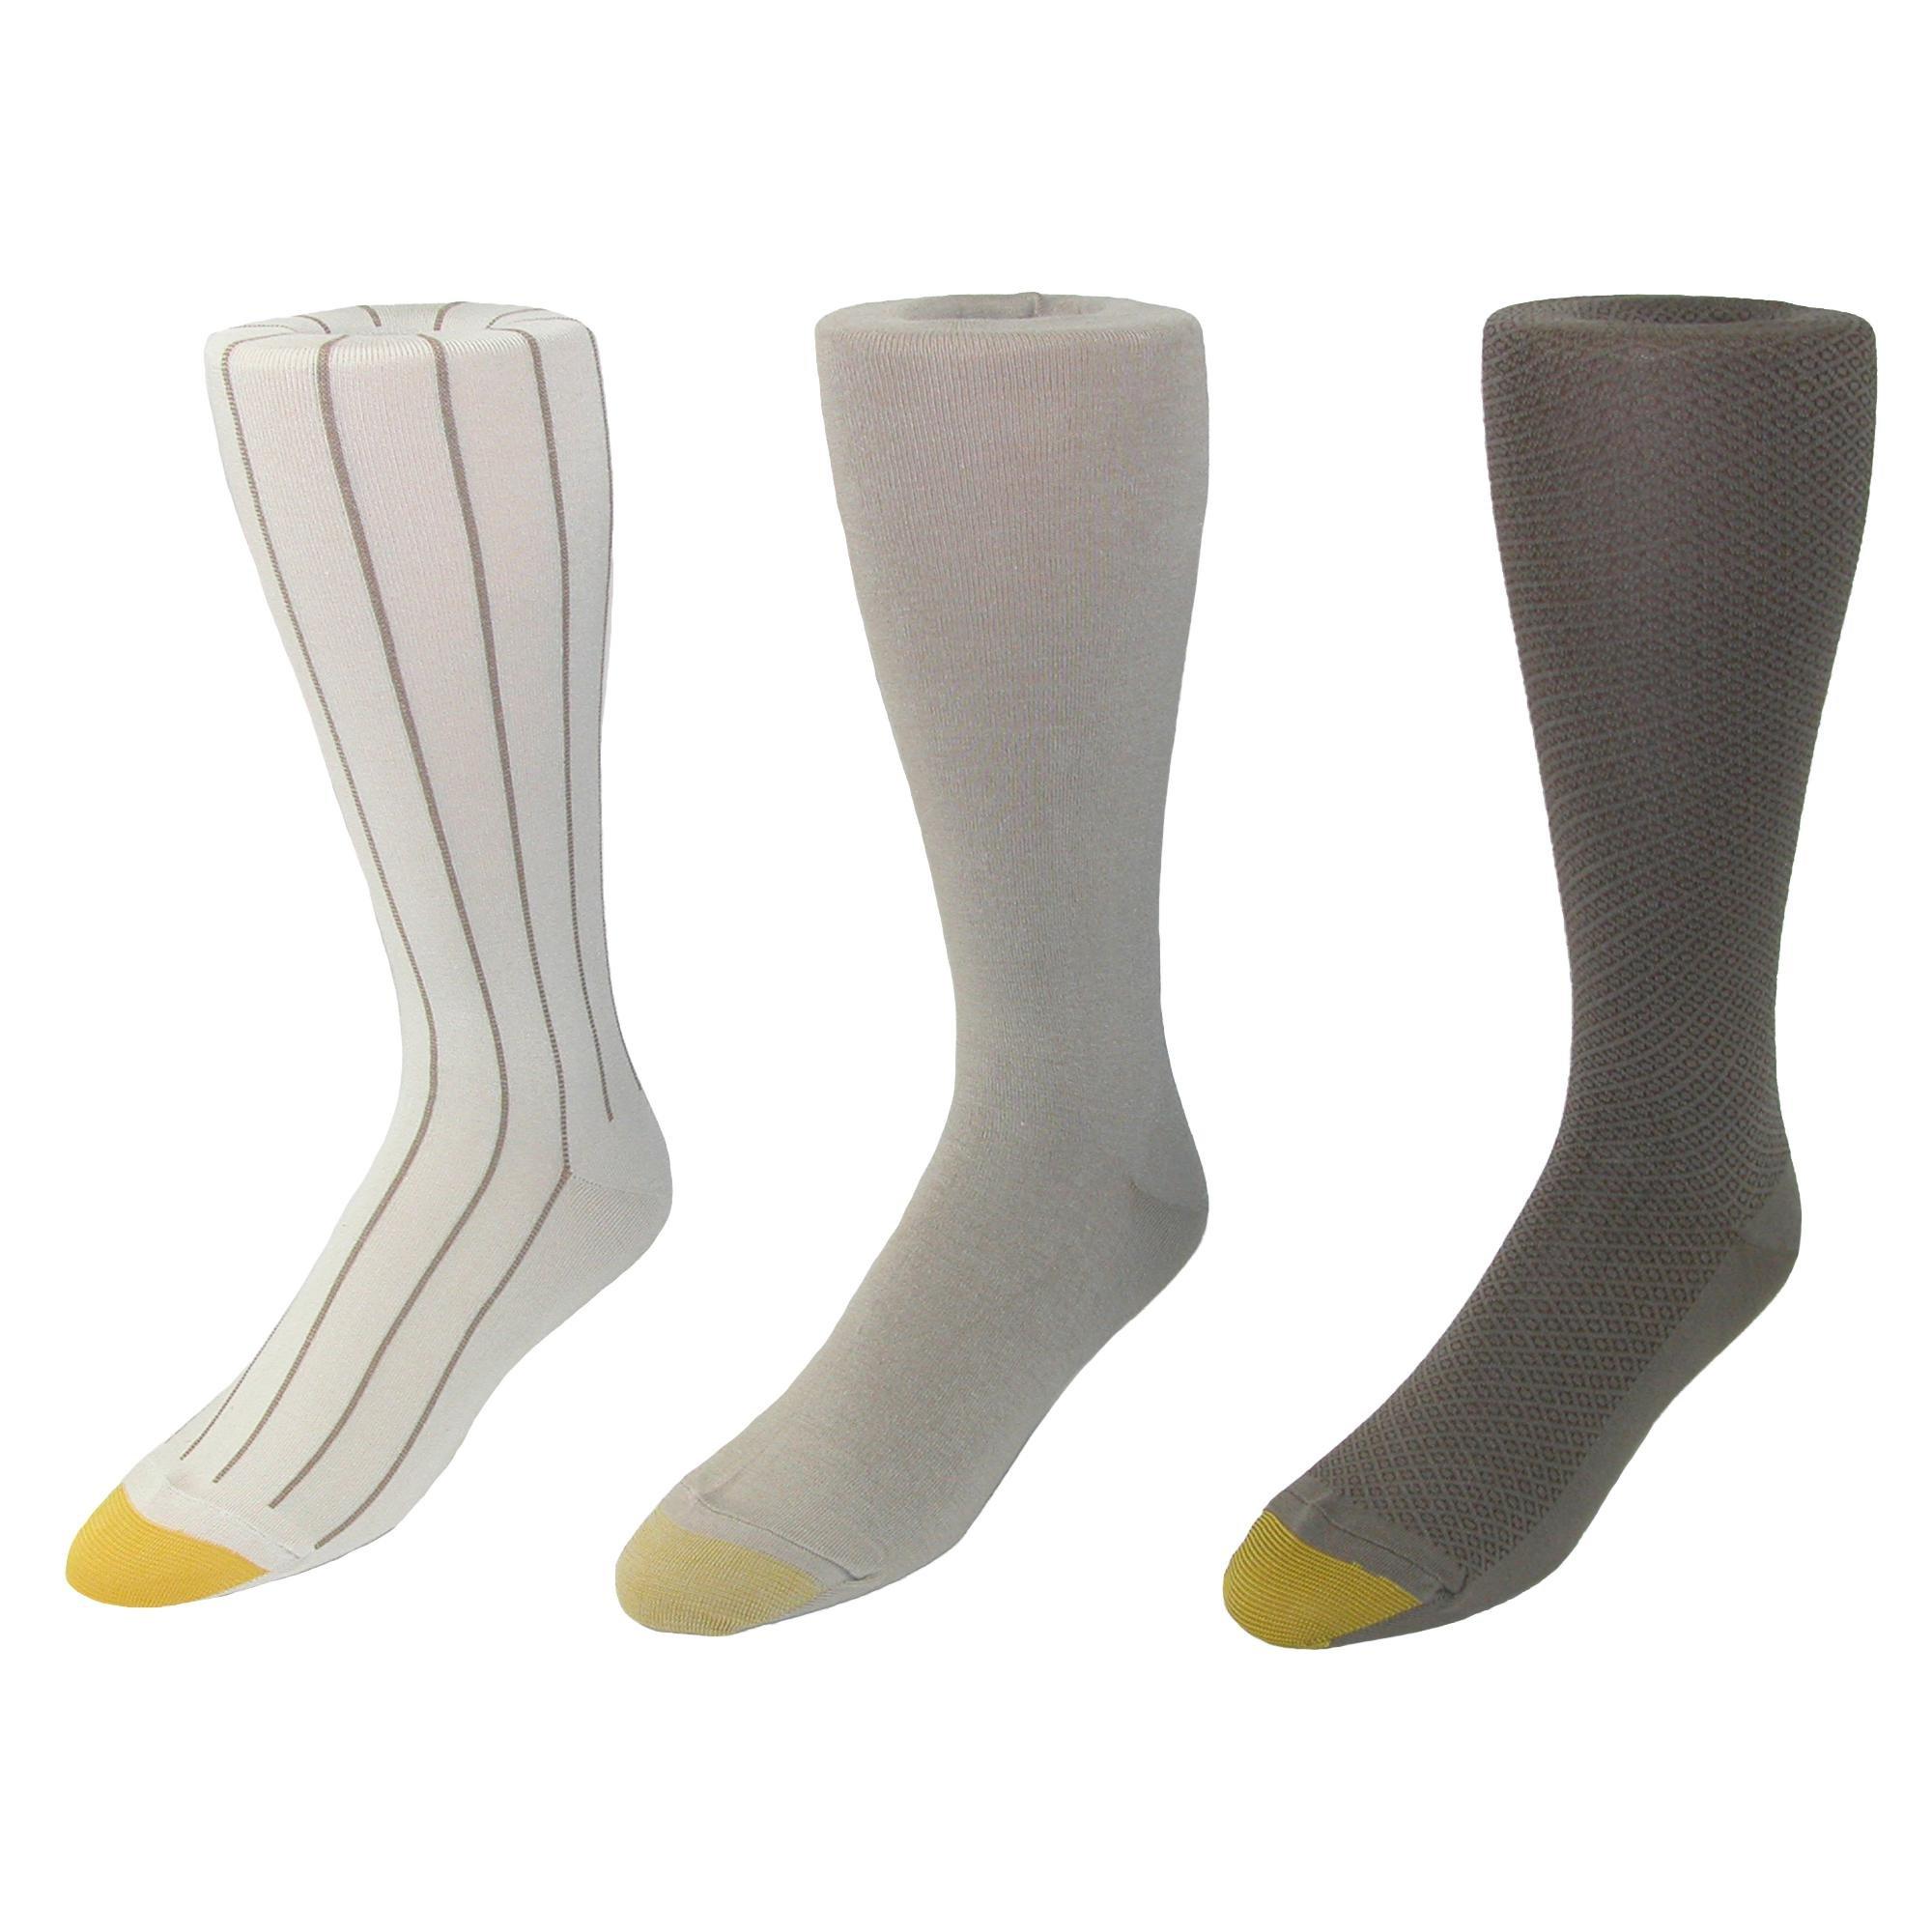 Gold Toe Men's Over the Calf Moisture Control Fashion Socks (Pack of 3), Beige